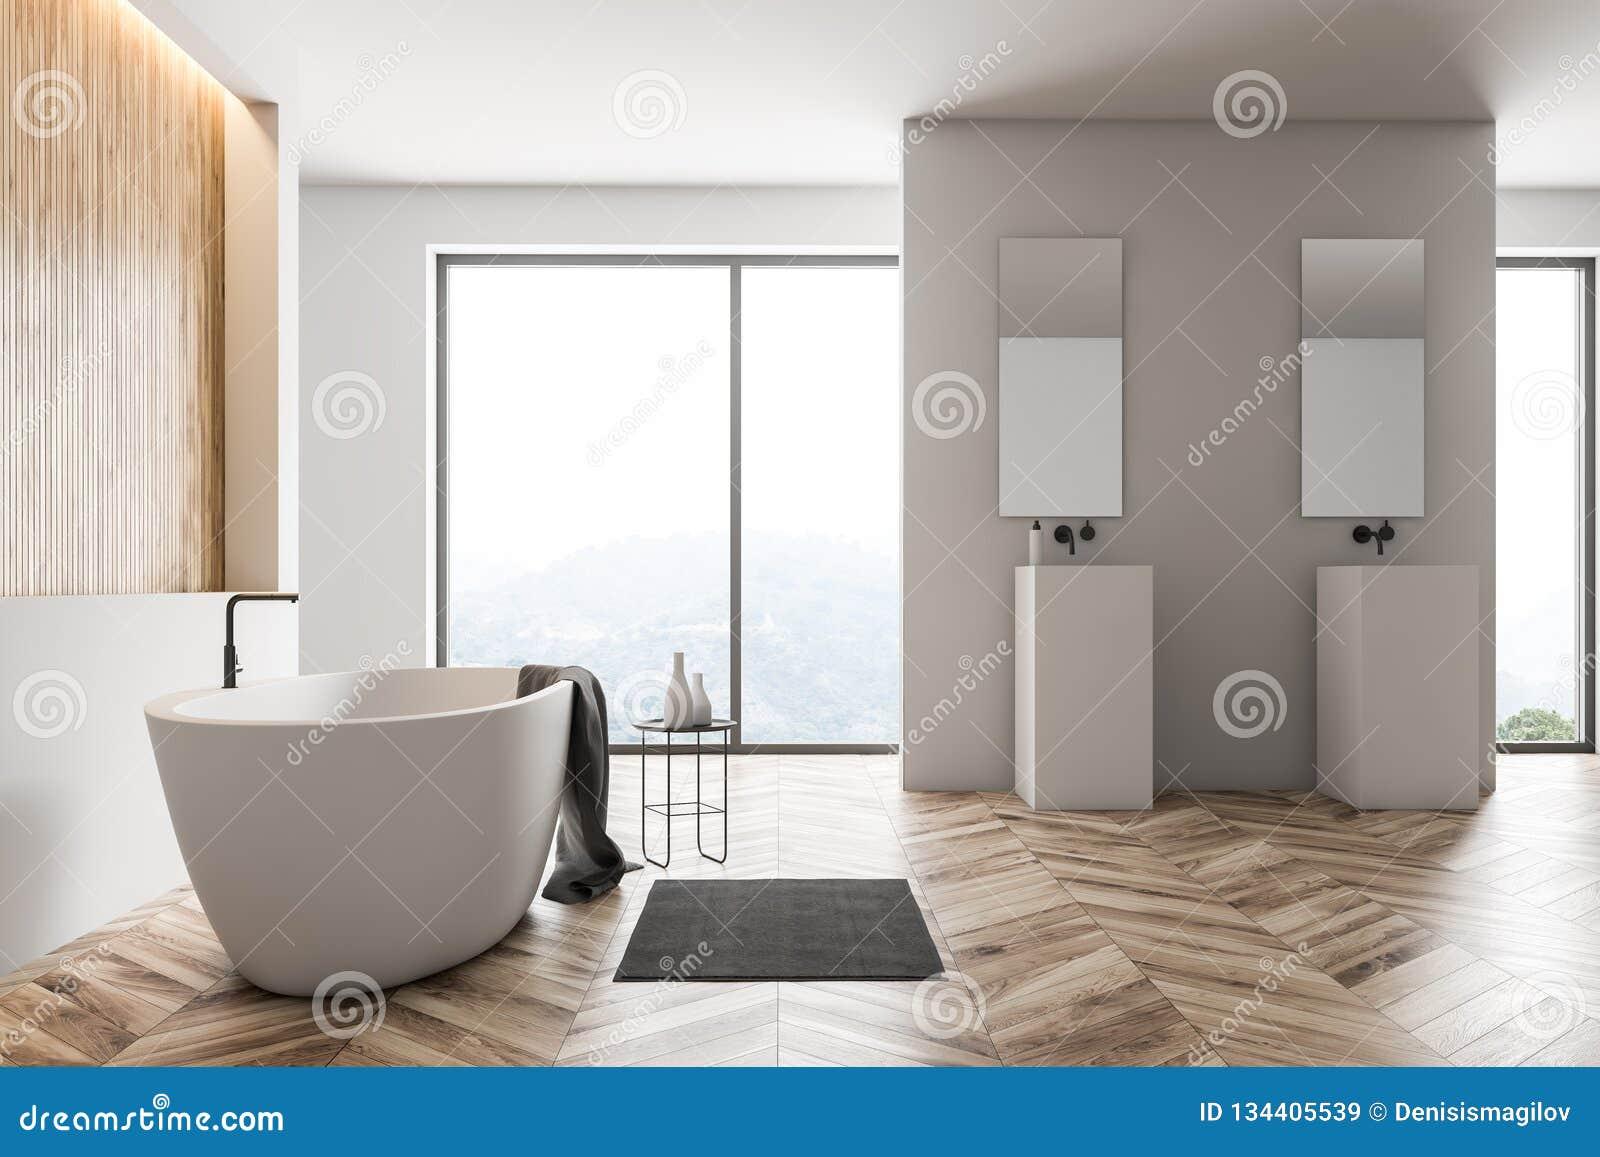 . White And Wood Bathroom  Window Stock Illustration   Illustration of